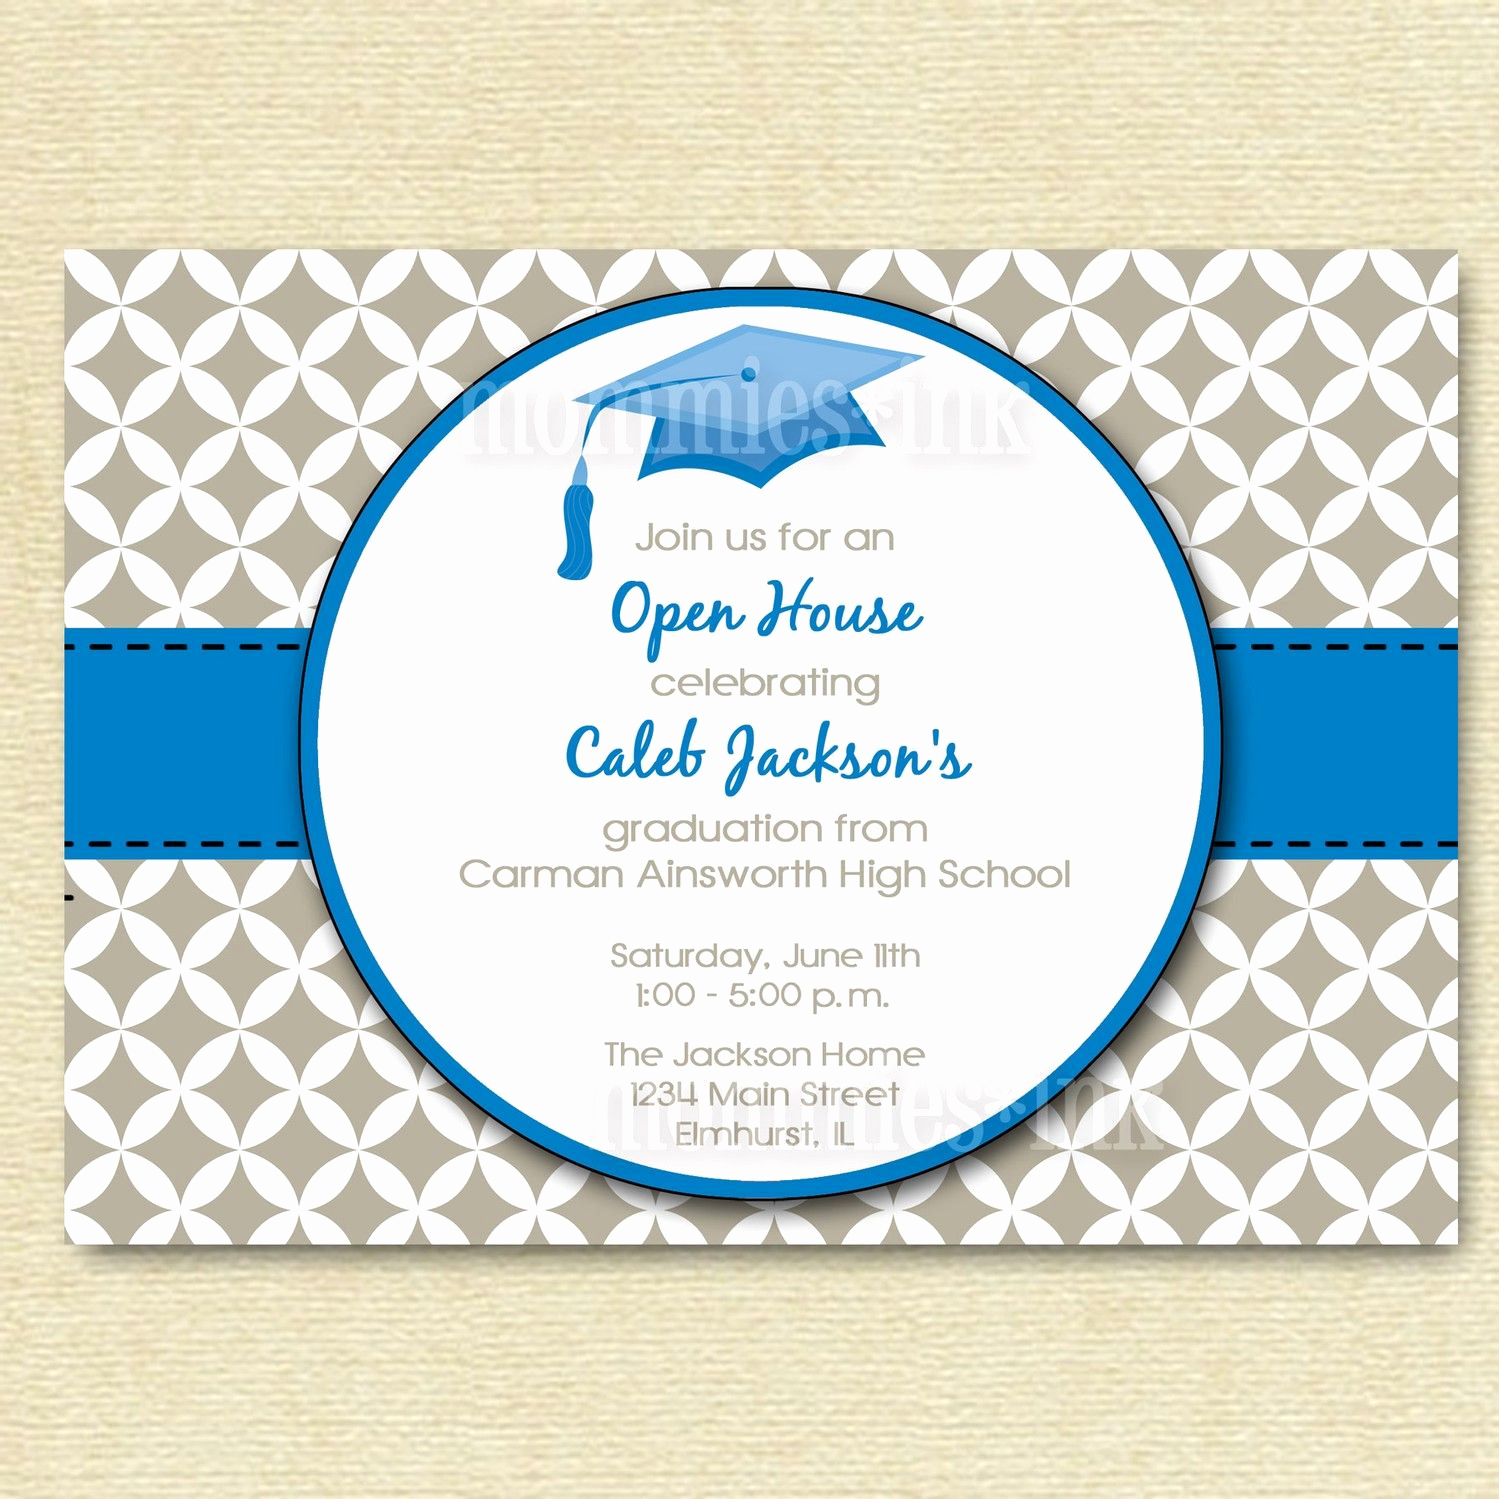 Open House Invitation Ideas Inspirational Mod Simple Quatrefoil 2 Graduation Open House by